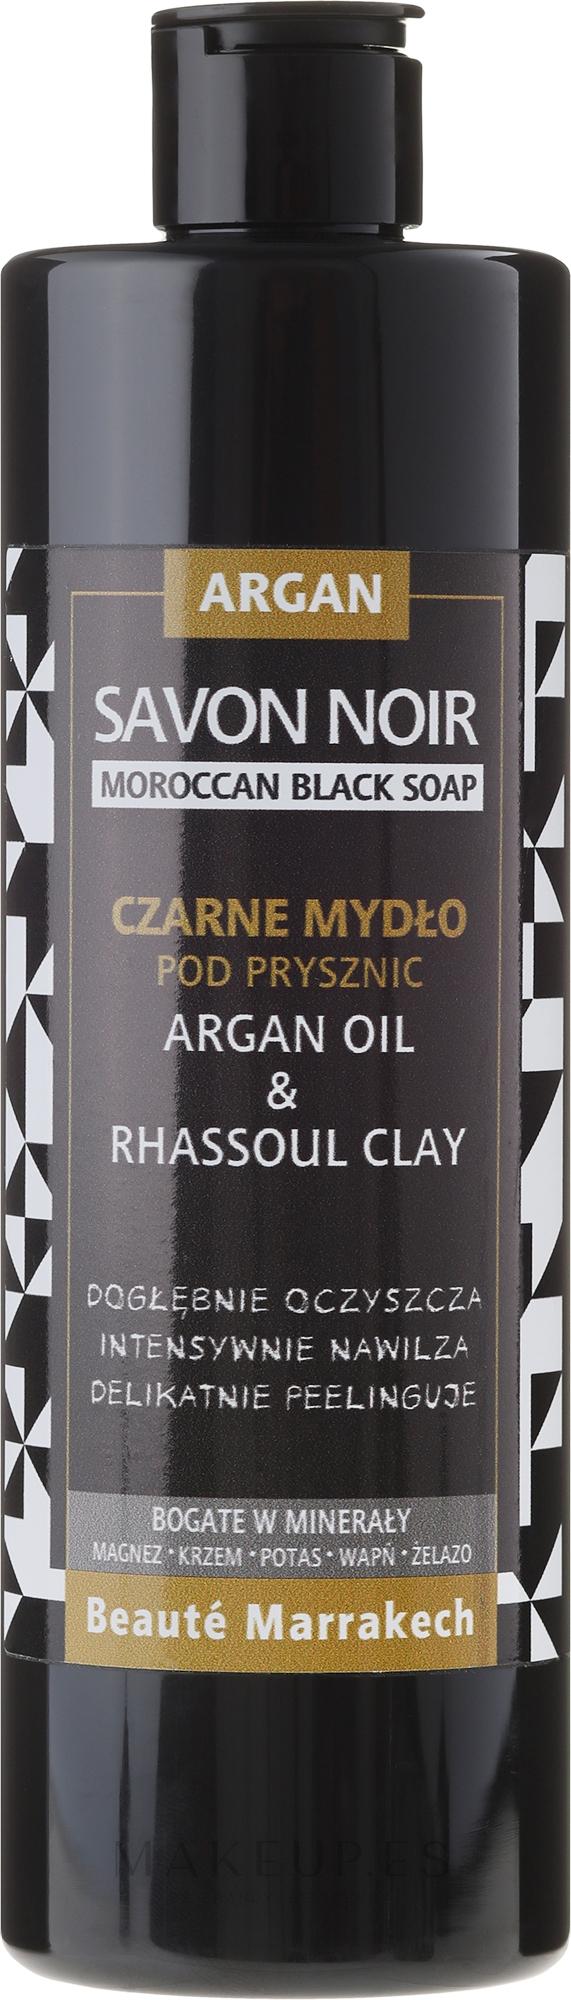 Jabón negro de ducha natural con aceite de argán y arcilla Rhassoul - Beaute Marrakech Shower Black Soap Argan Oil & Rhassoul Clay — imagen 400 ml